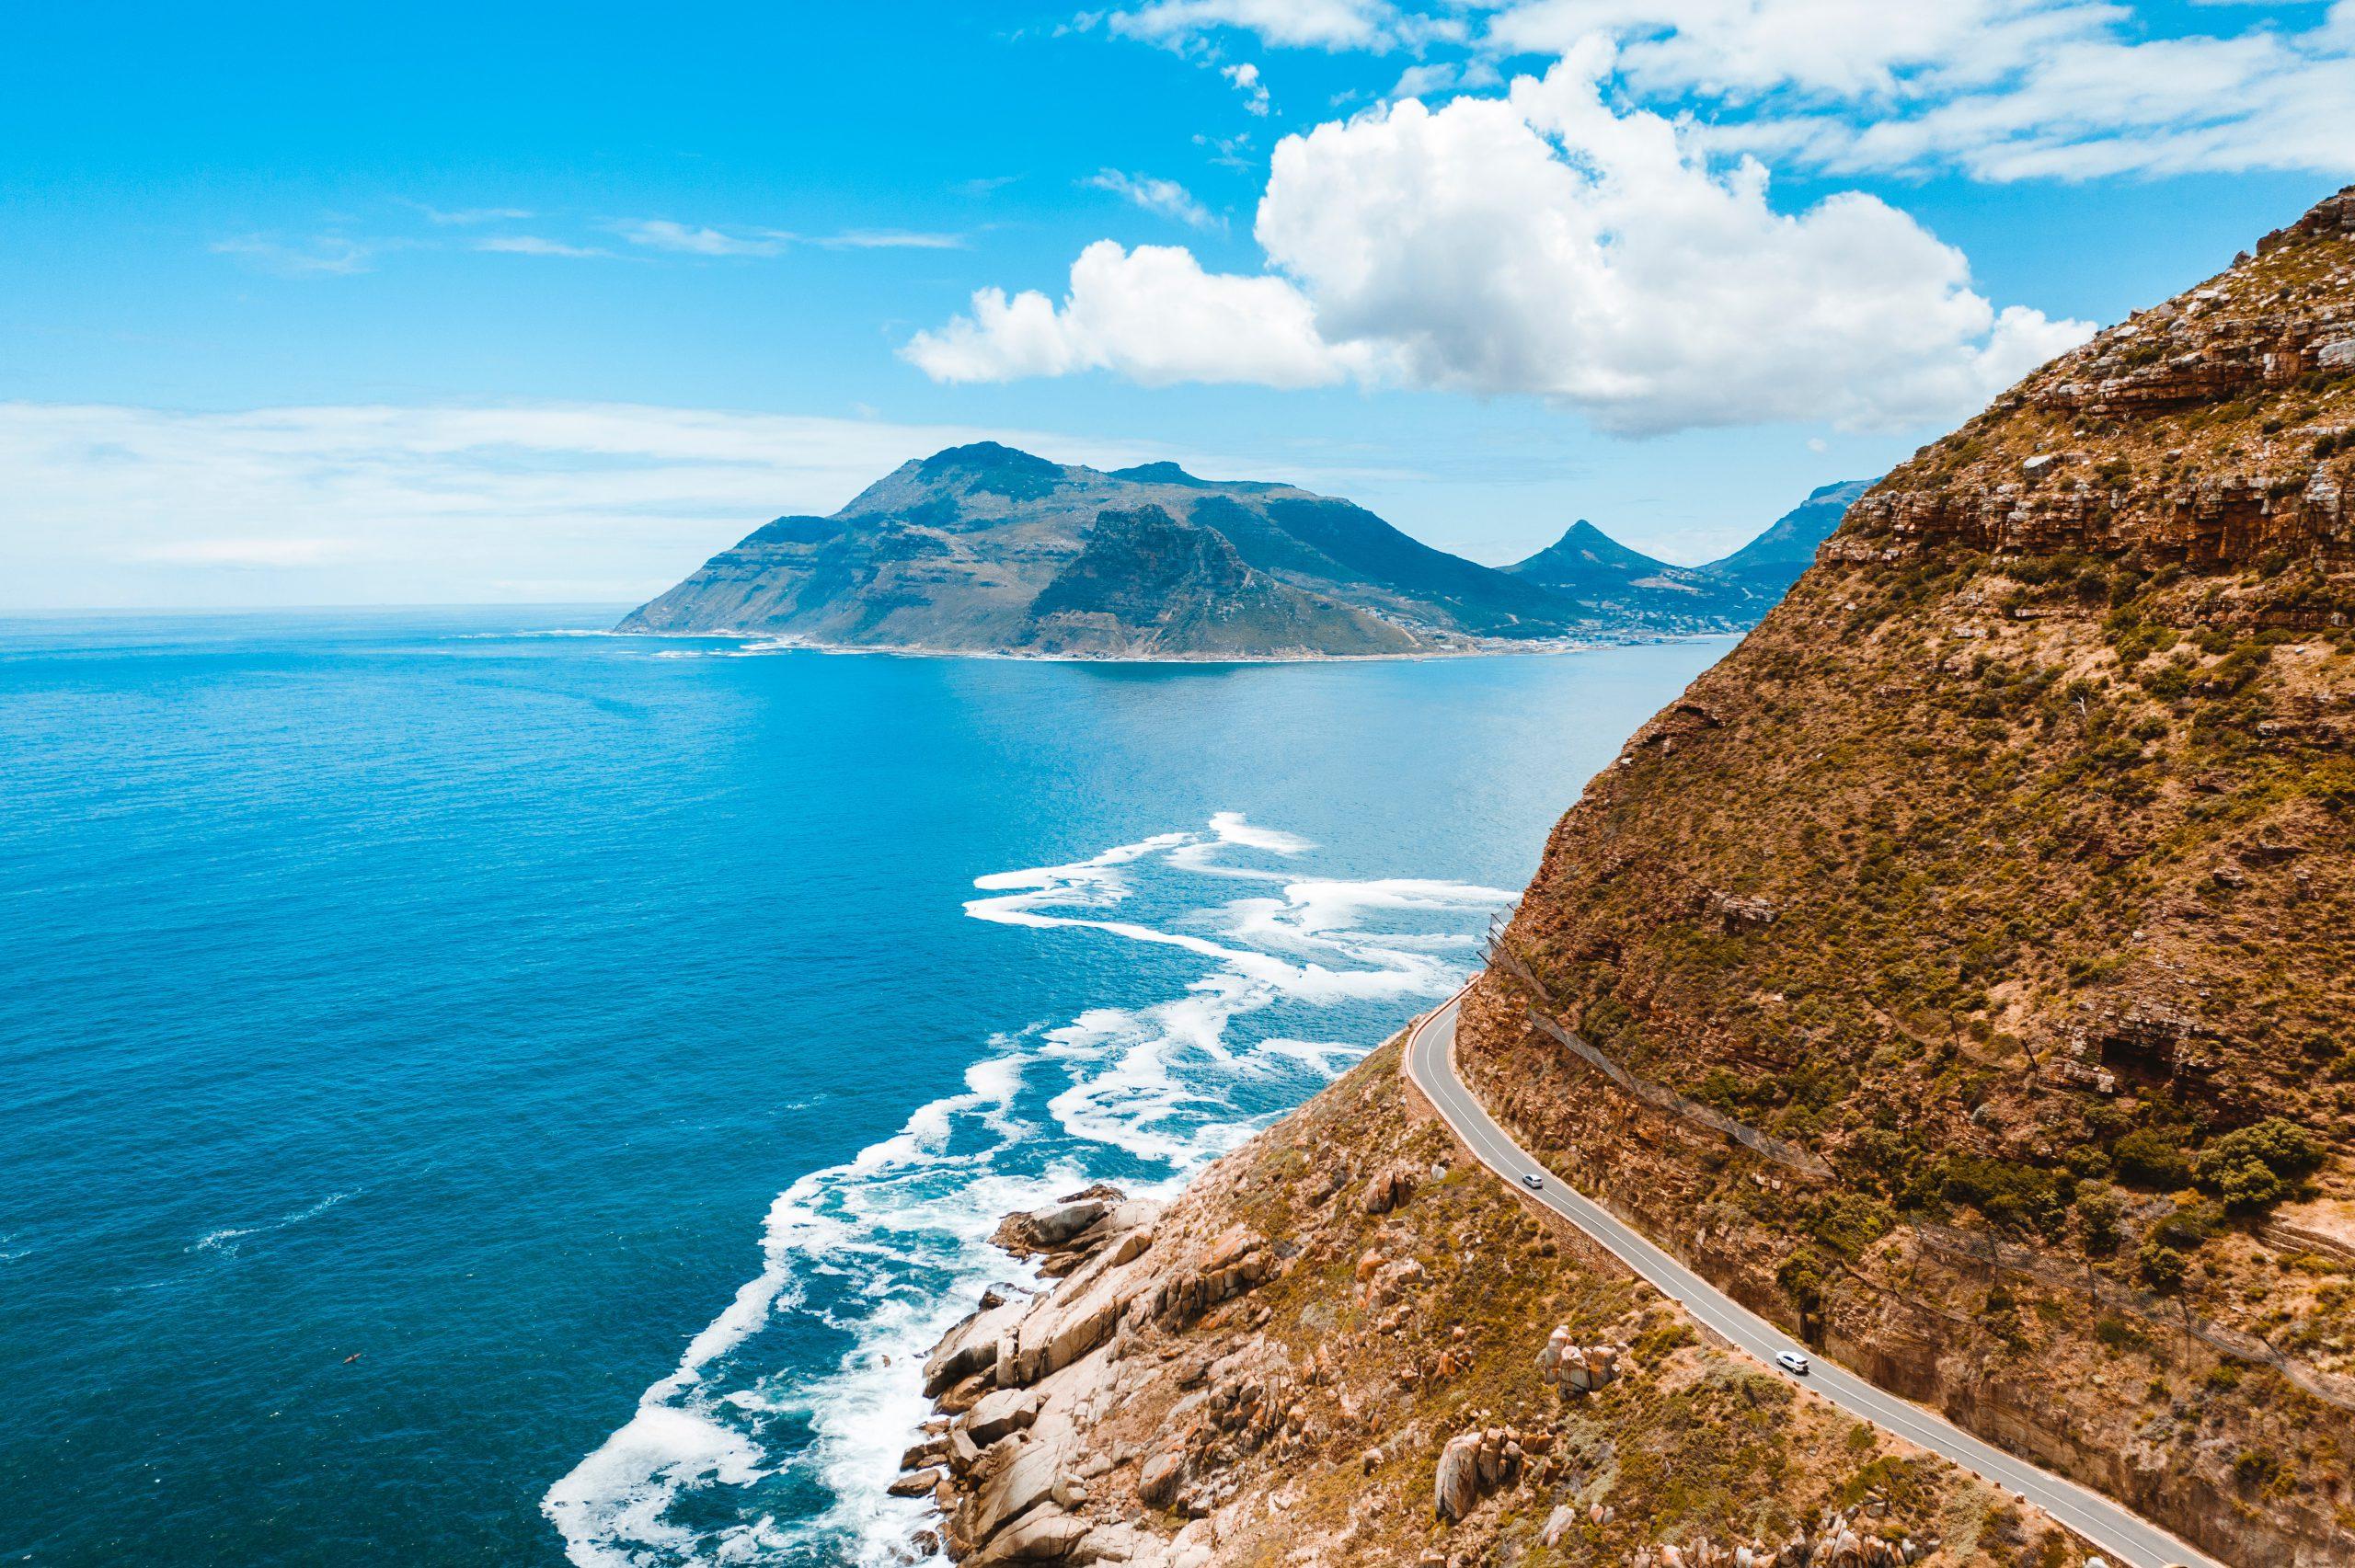 Chapman's Peak in South Africa